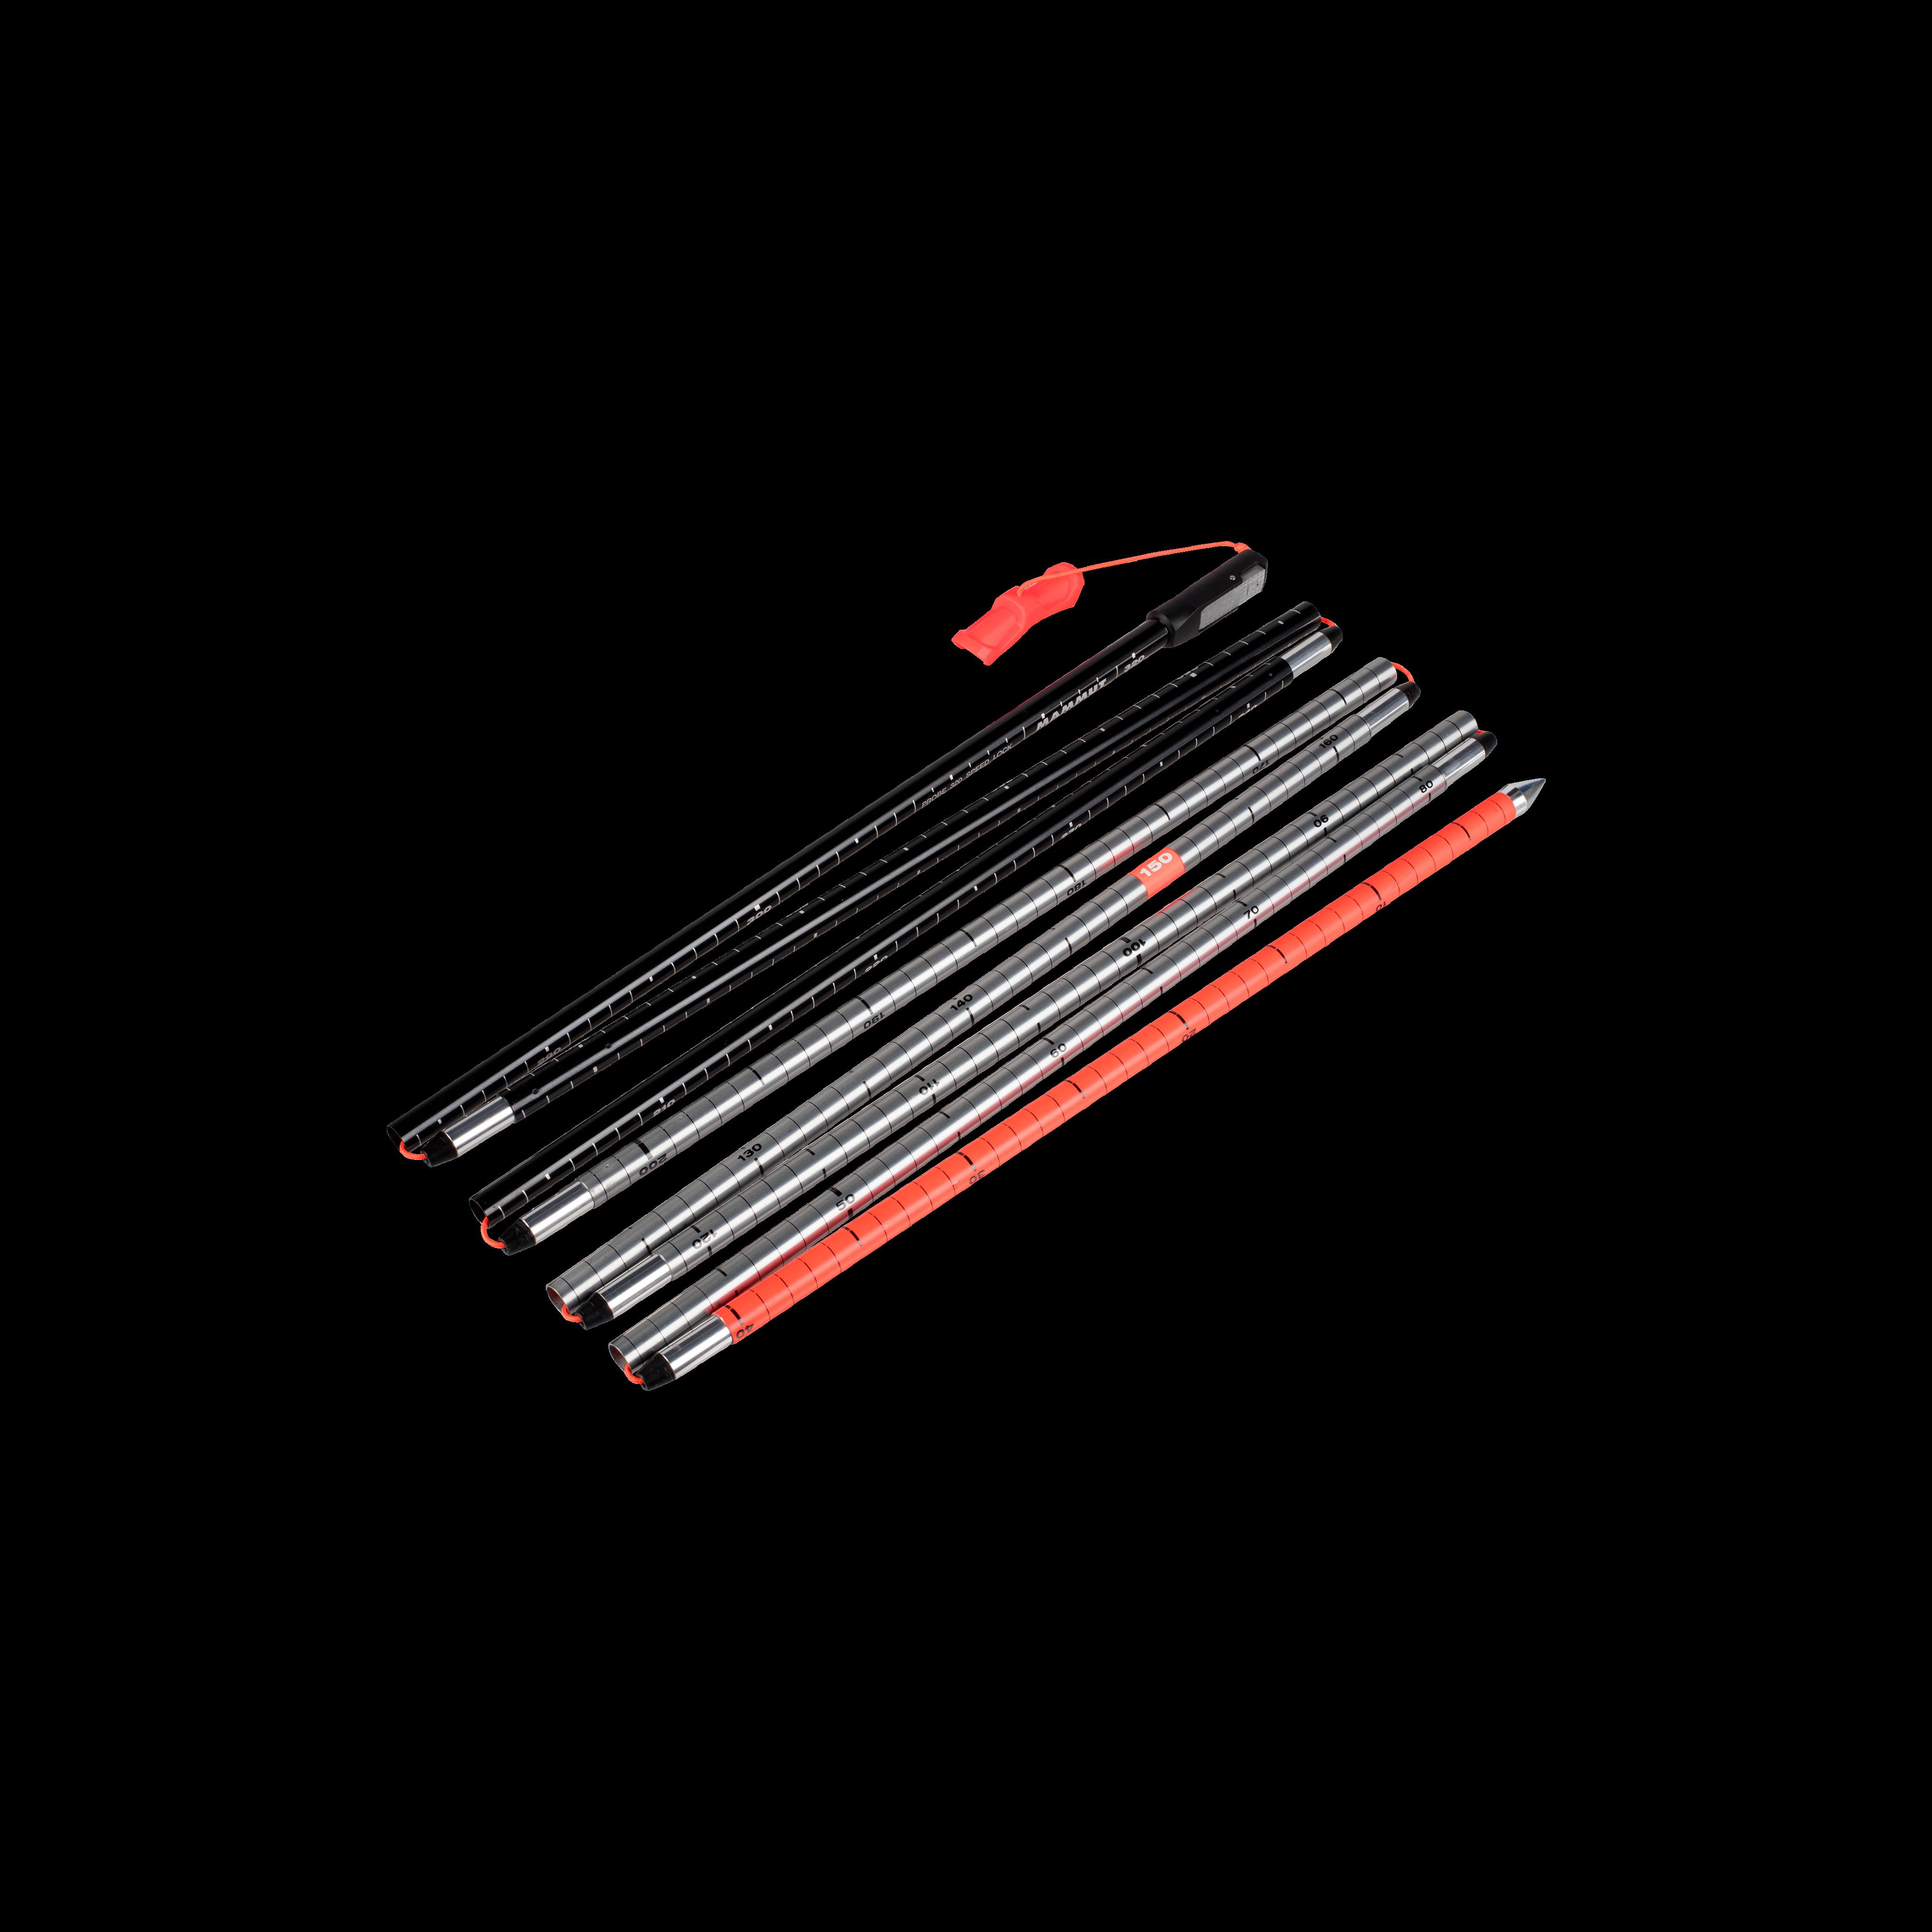 Probe 320 speed lock - neon orange, one size thumbnail